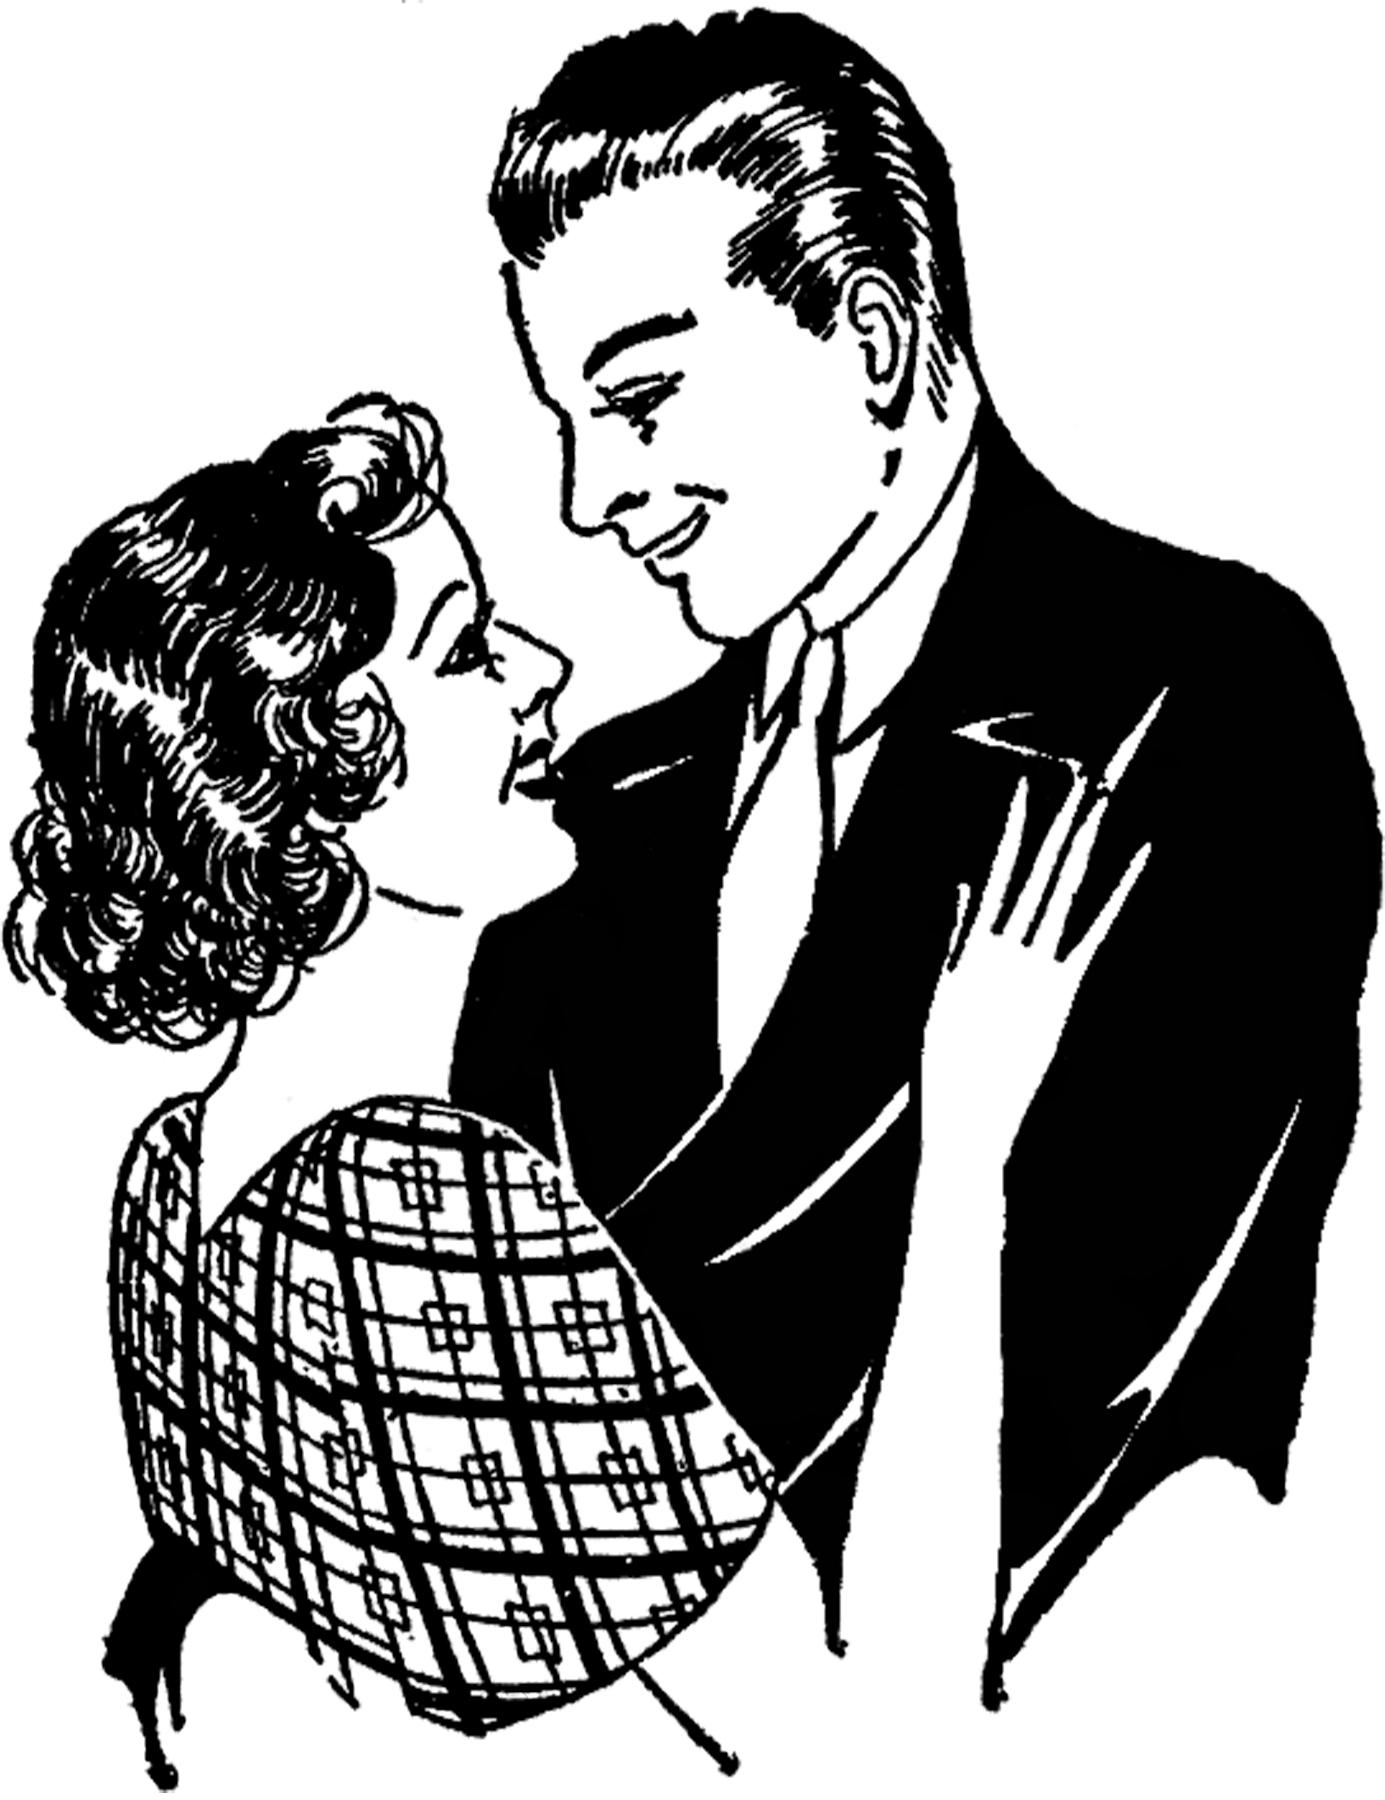 Vintage Couple Embrace Image